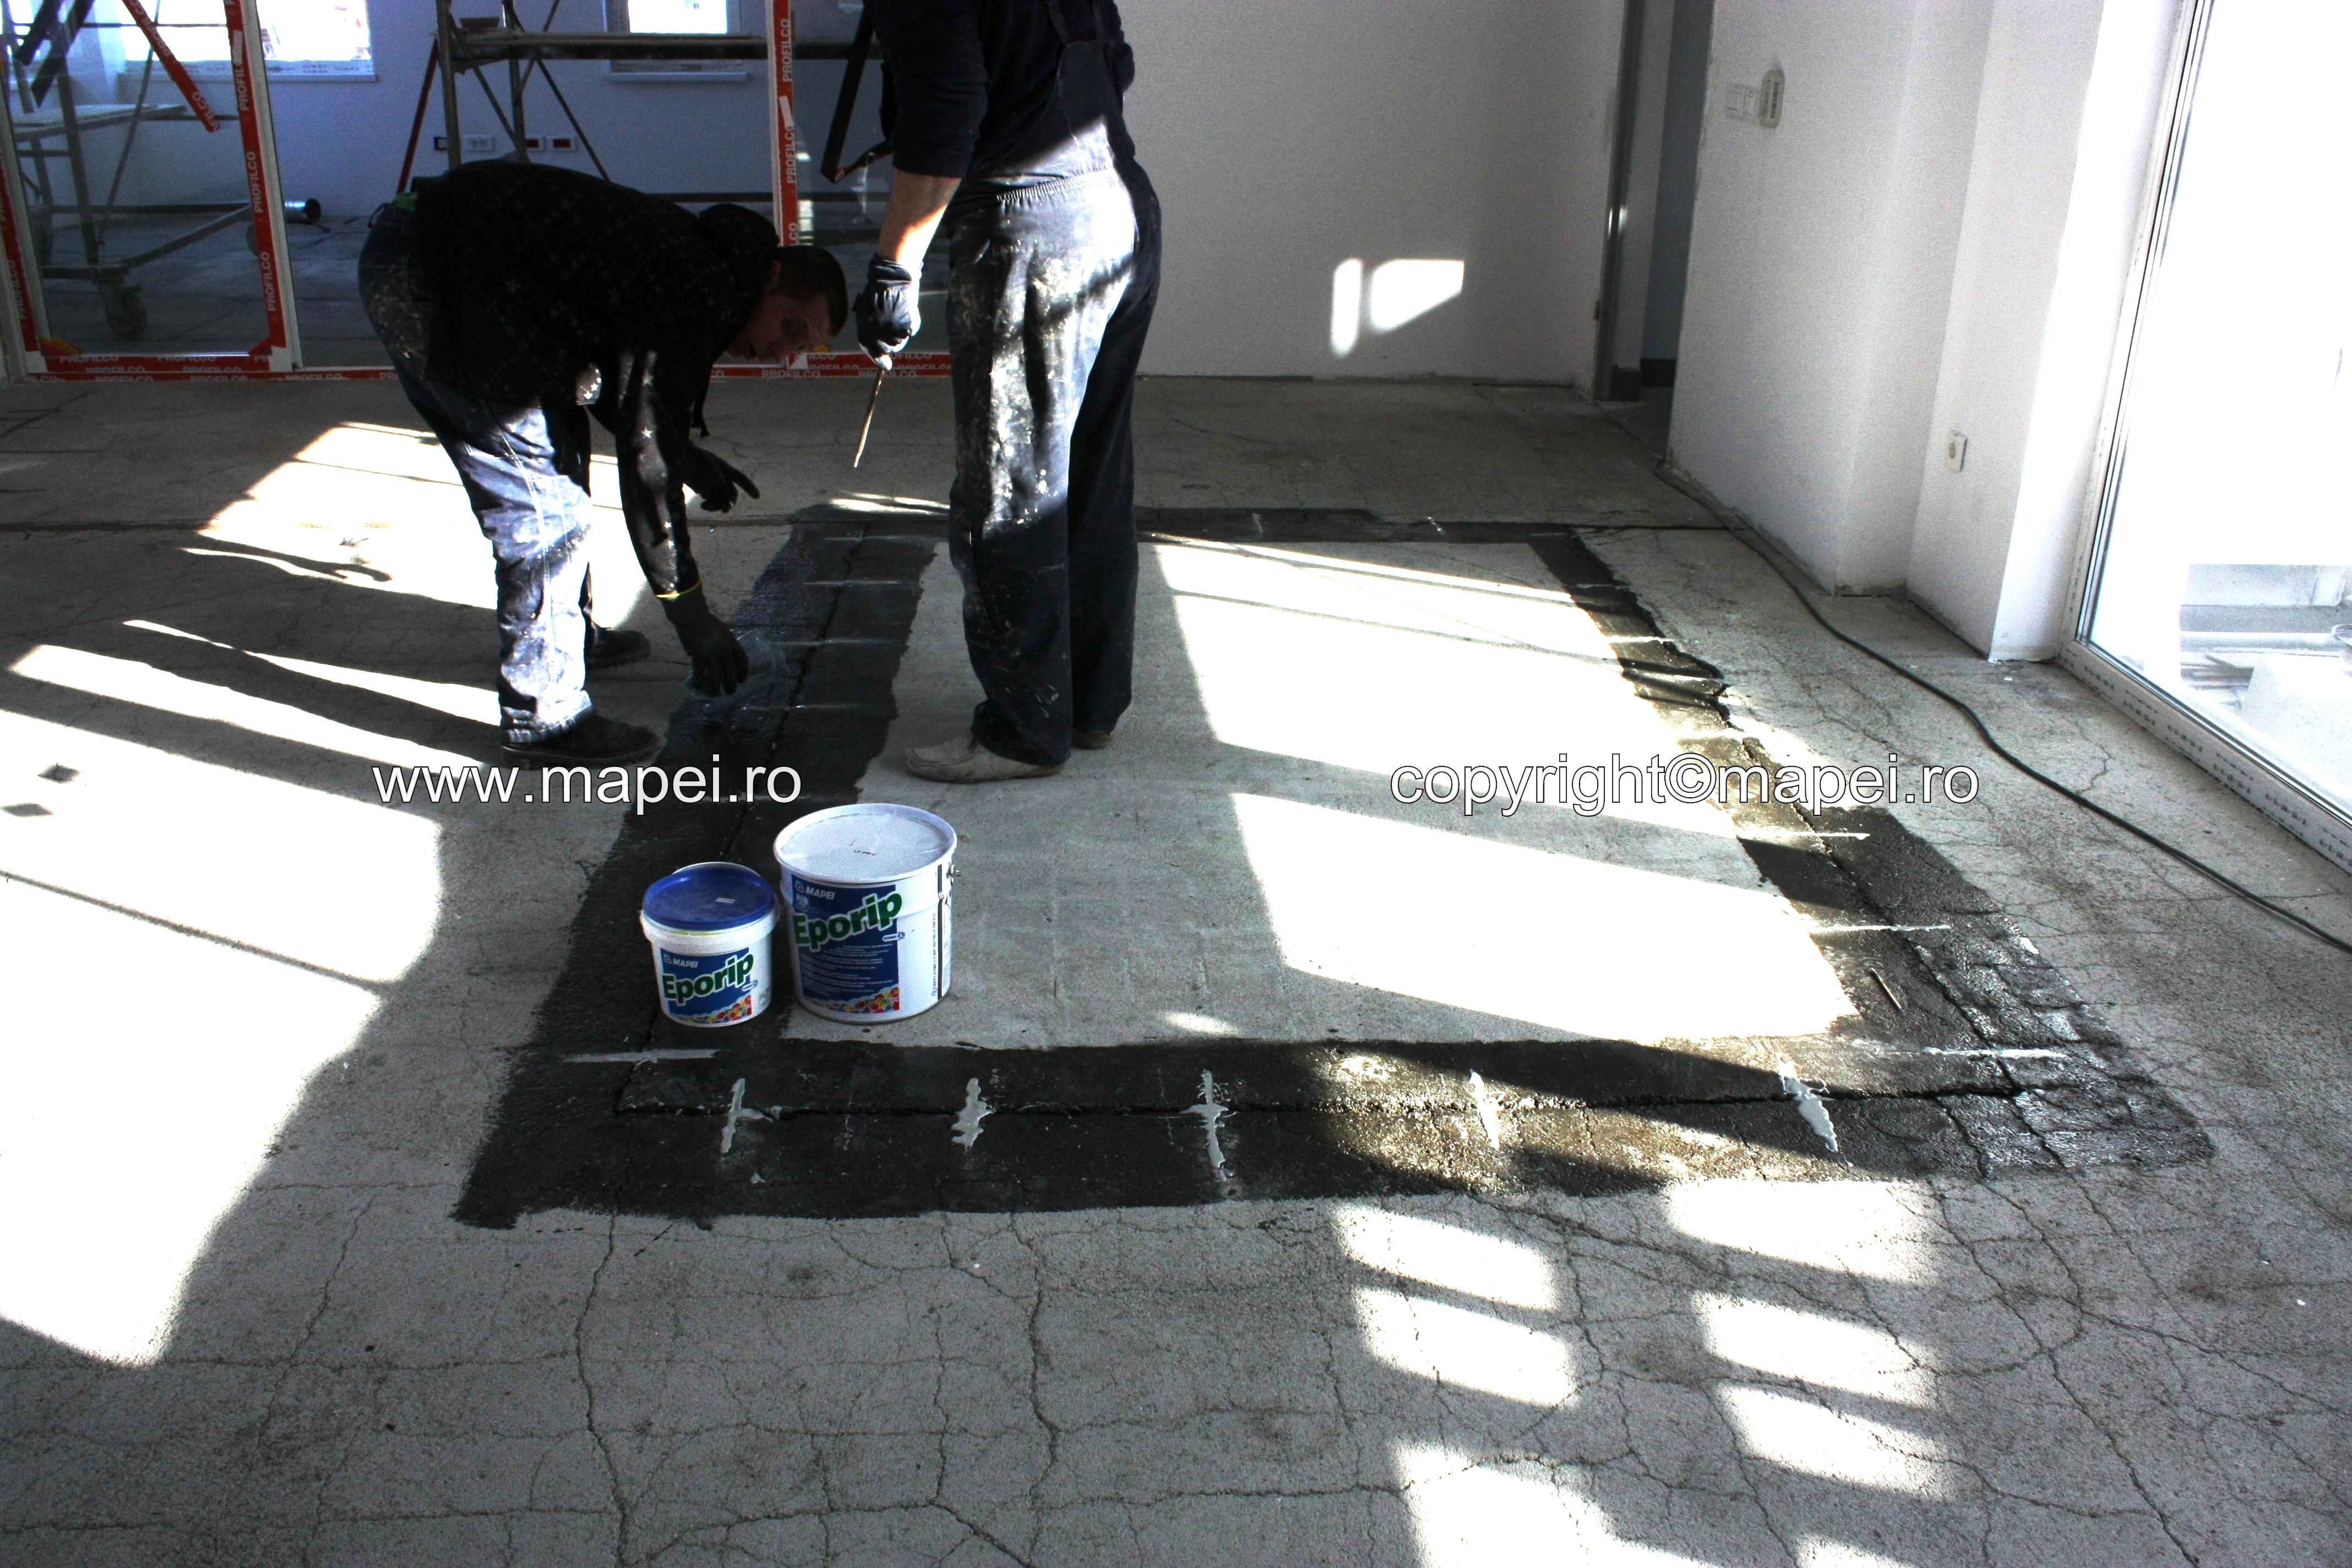 foto 13 - reparatii si consolidari sapa detaliu pardoseala - Galerie 4